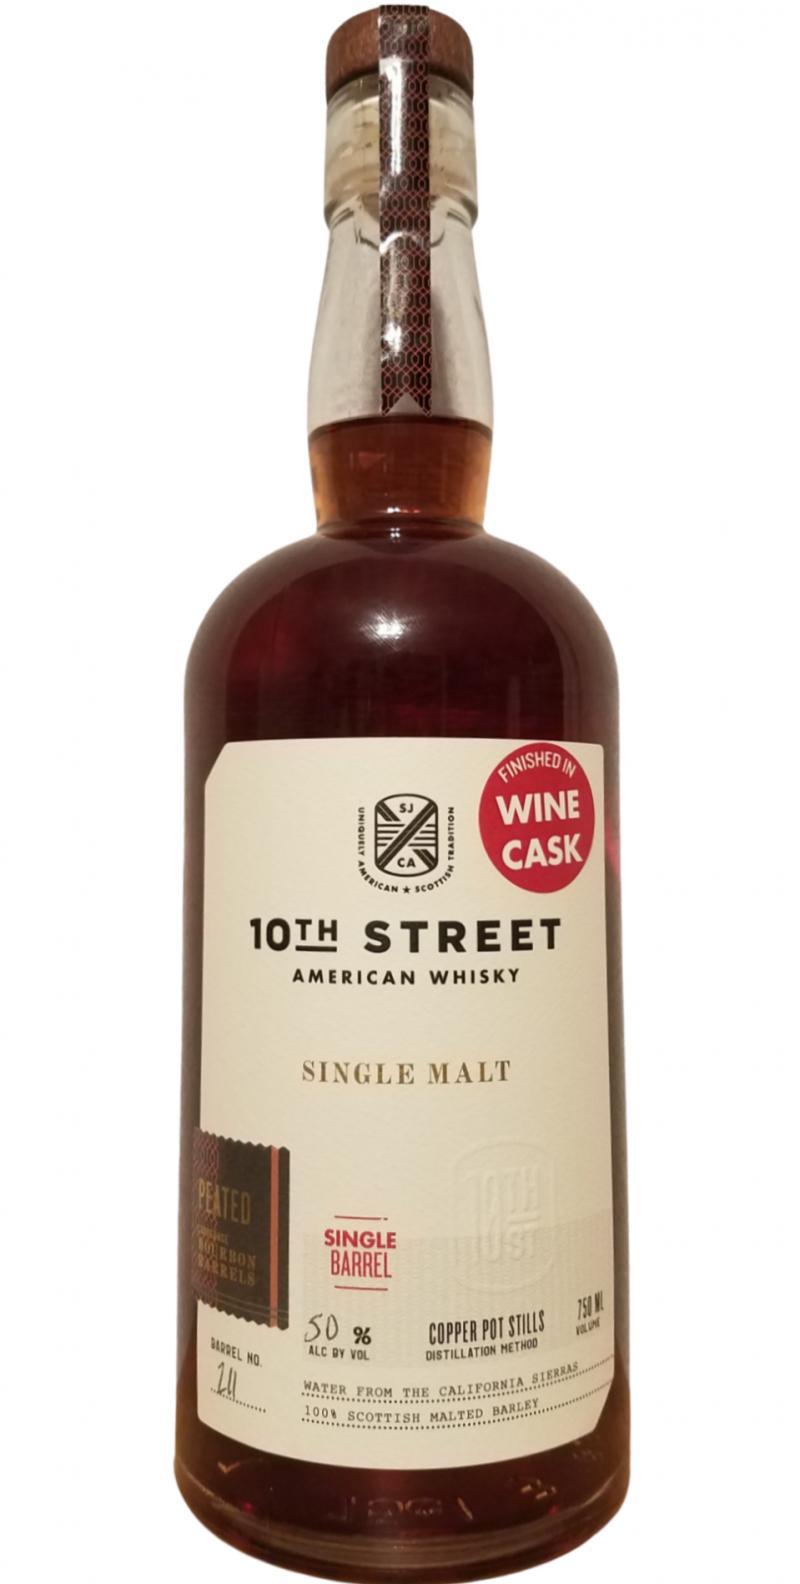 10th Street Single Malt